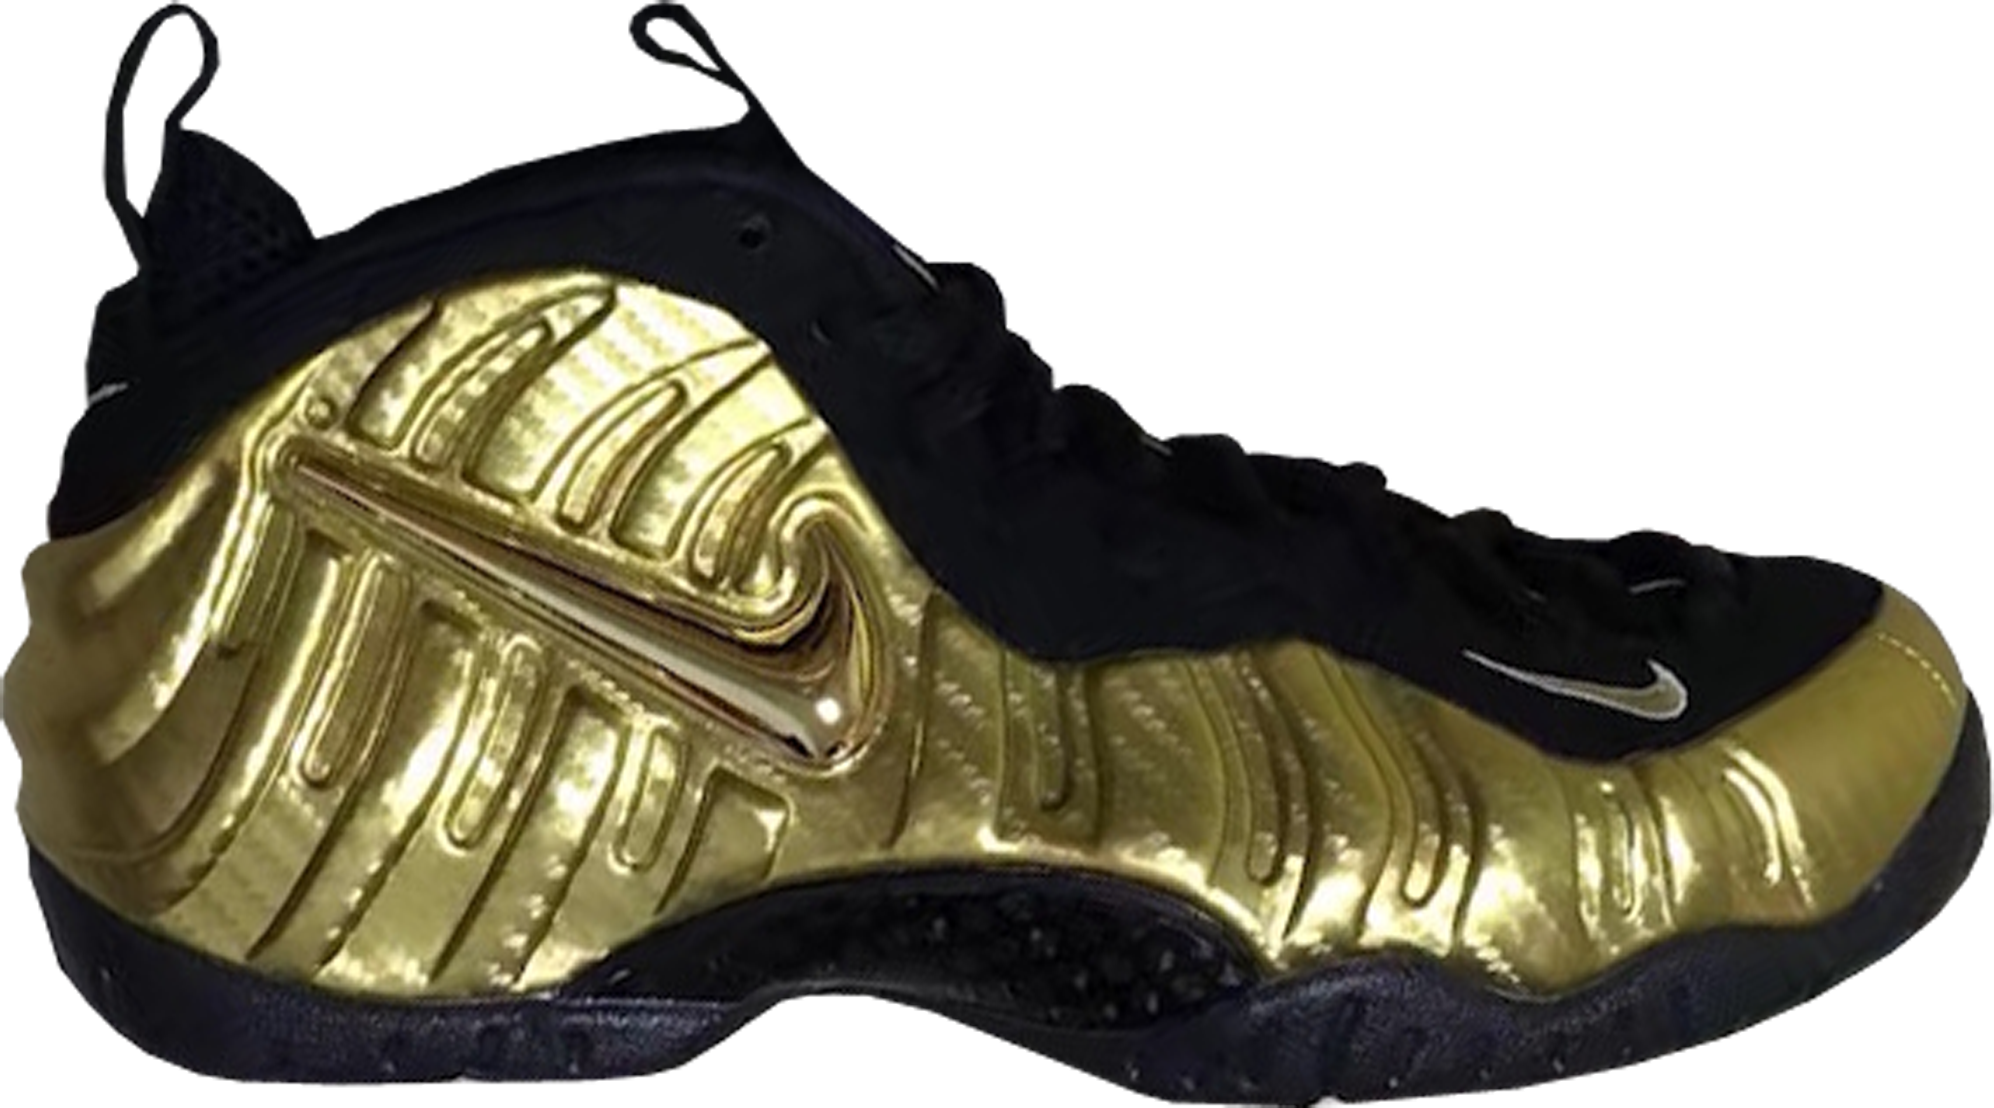 kd 7 shoes foamposites for sale size 7